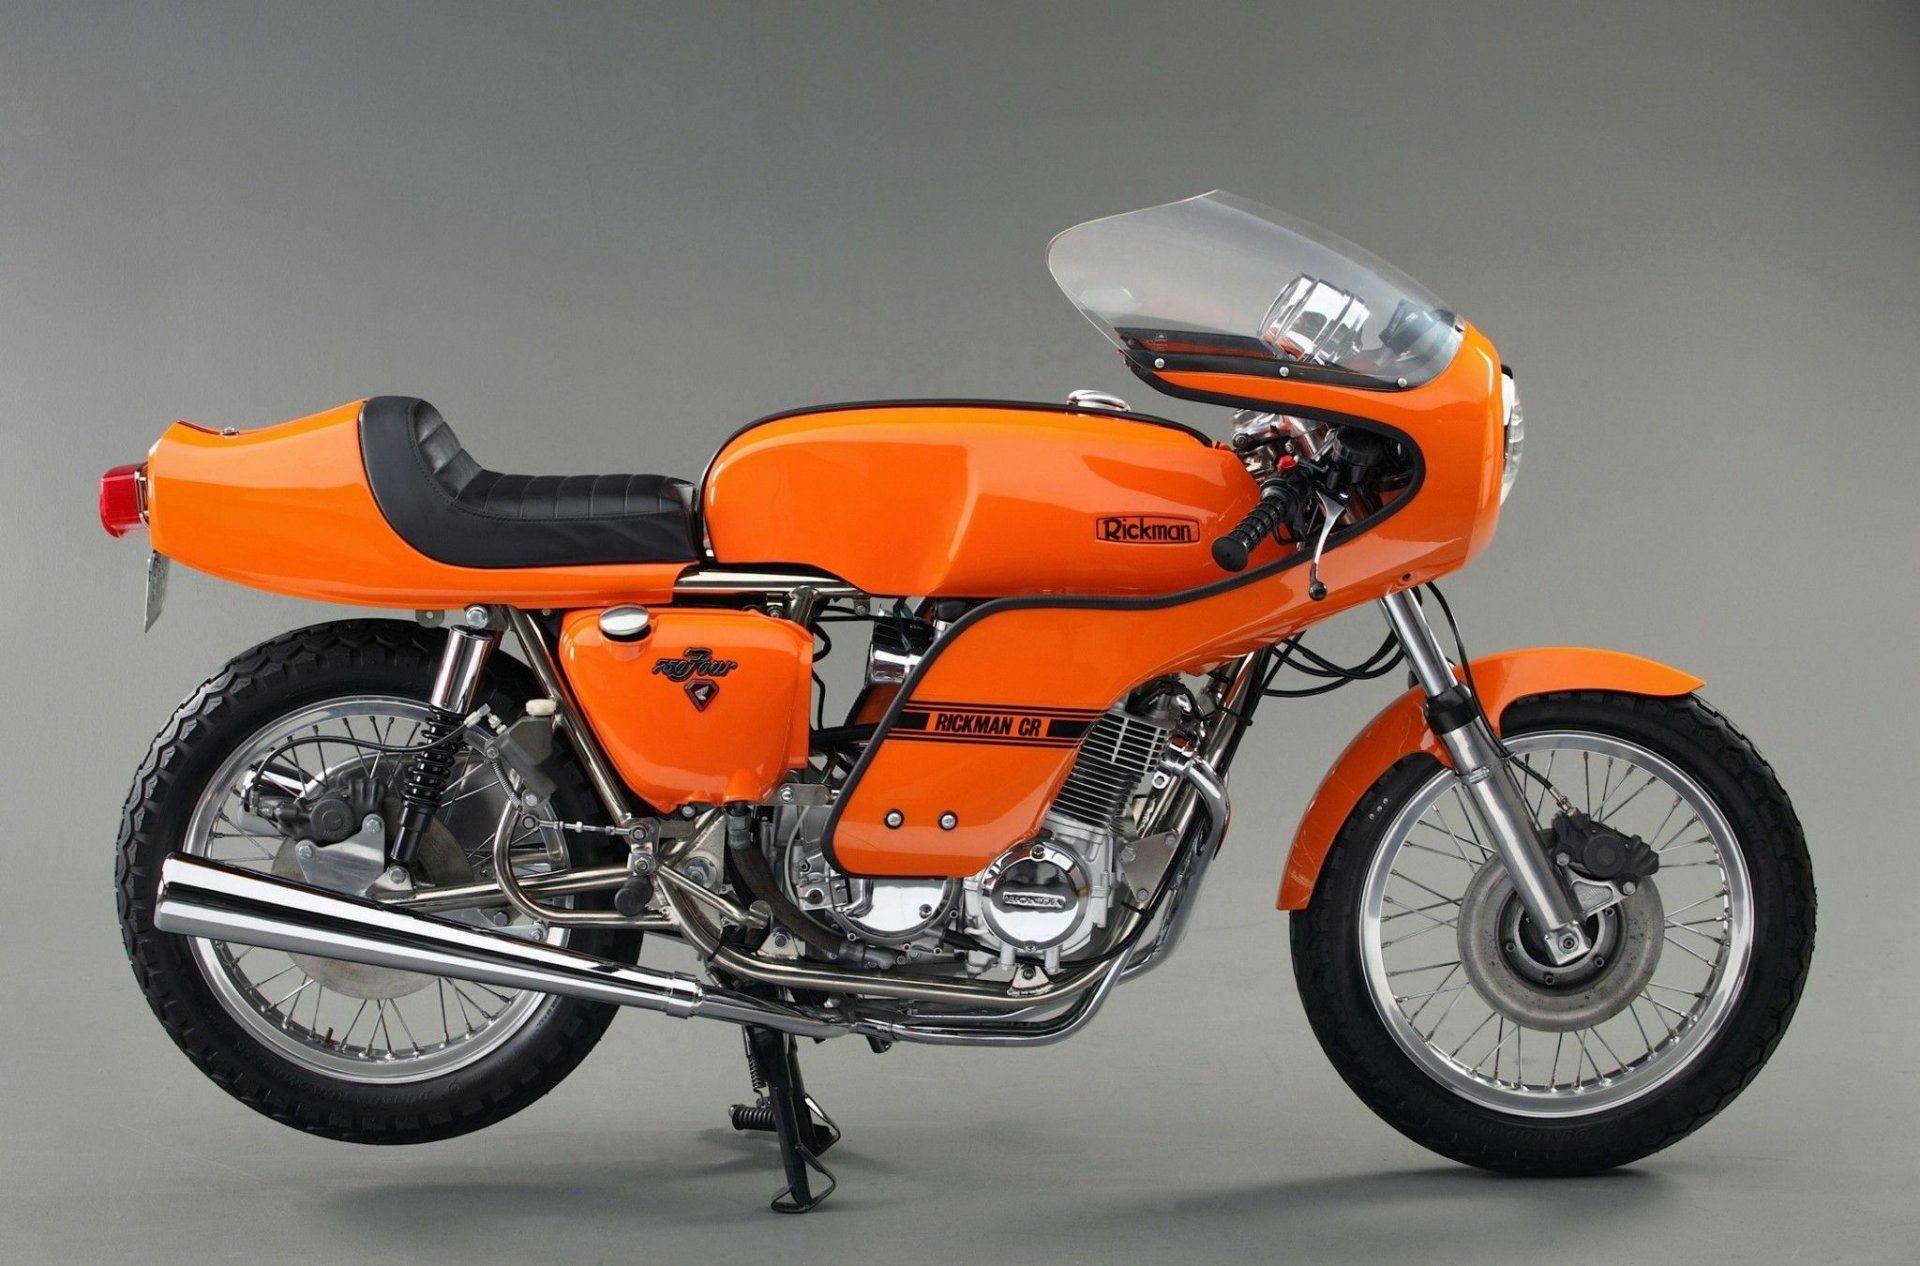 Moto del día: Honda Rickman CR 750 Café Racer